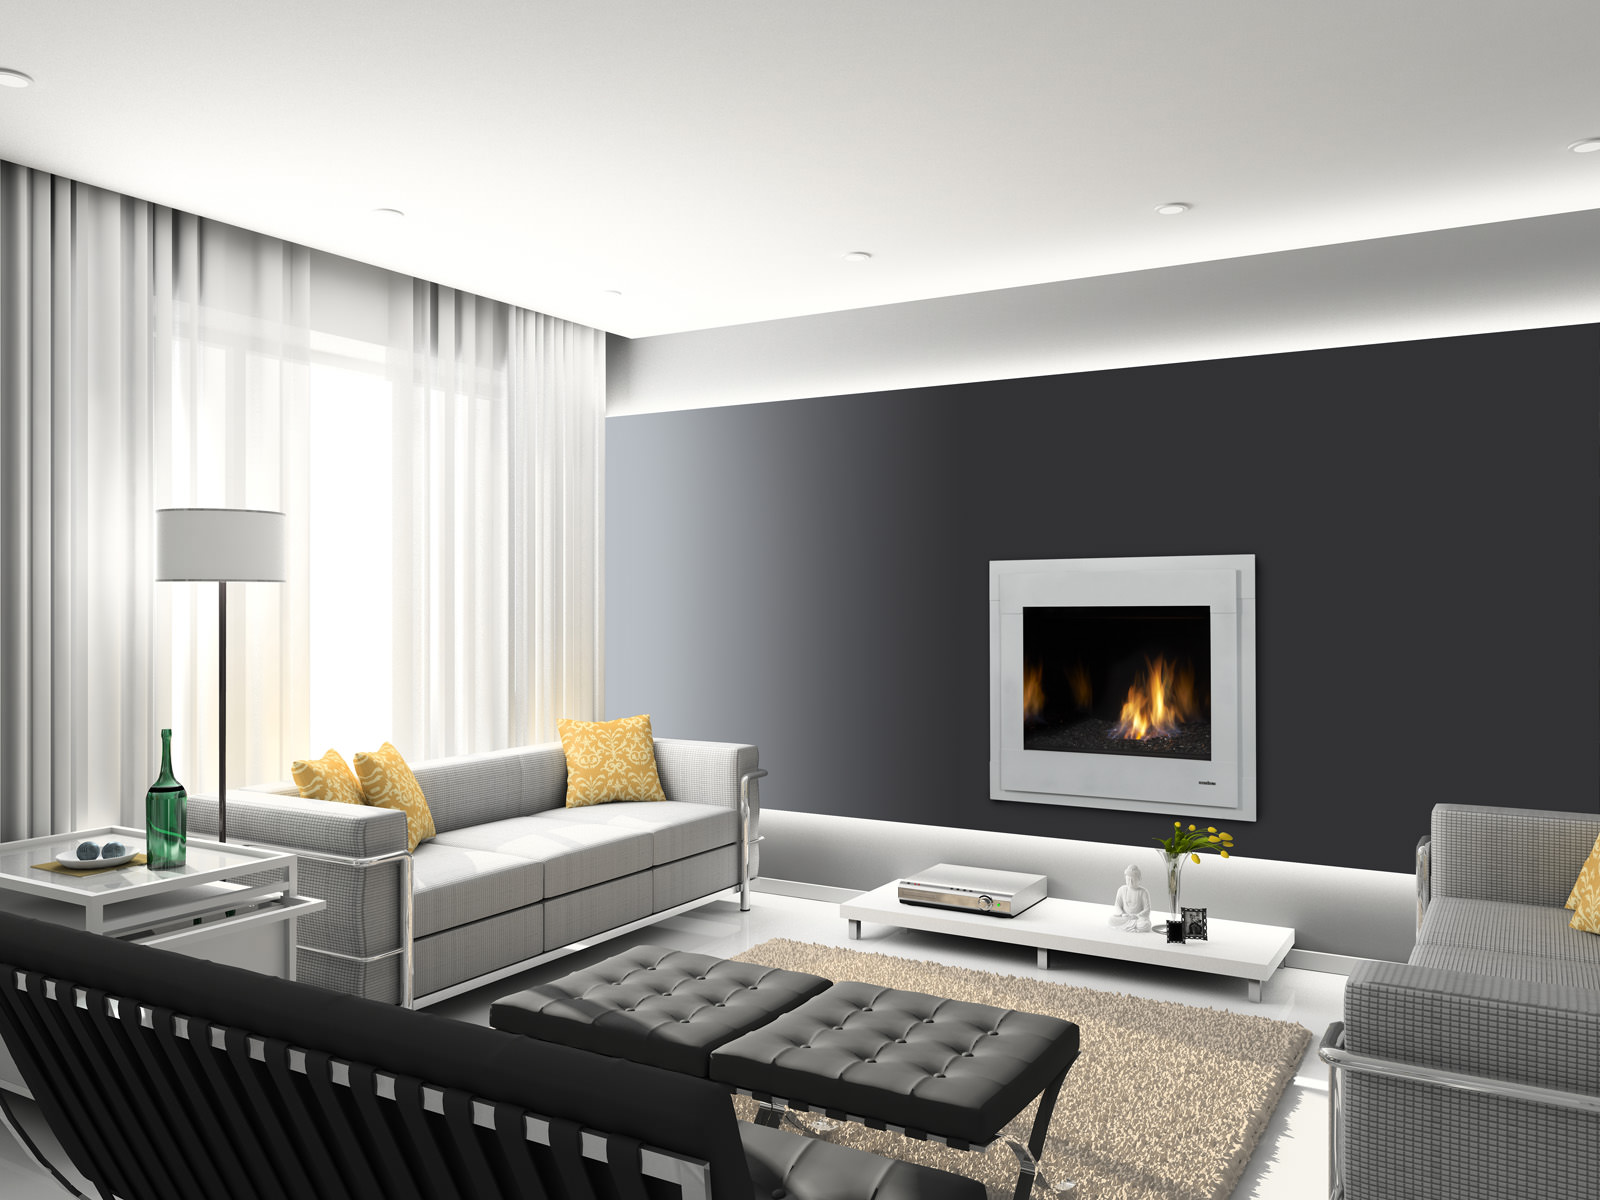 heat u0026 glo slimline series gas fireplace h2oasis